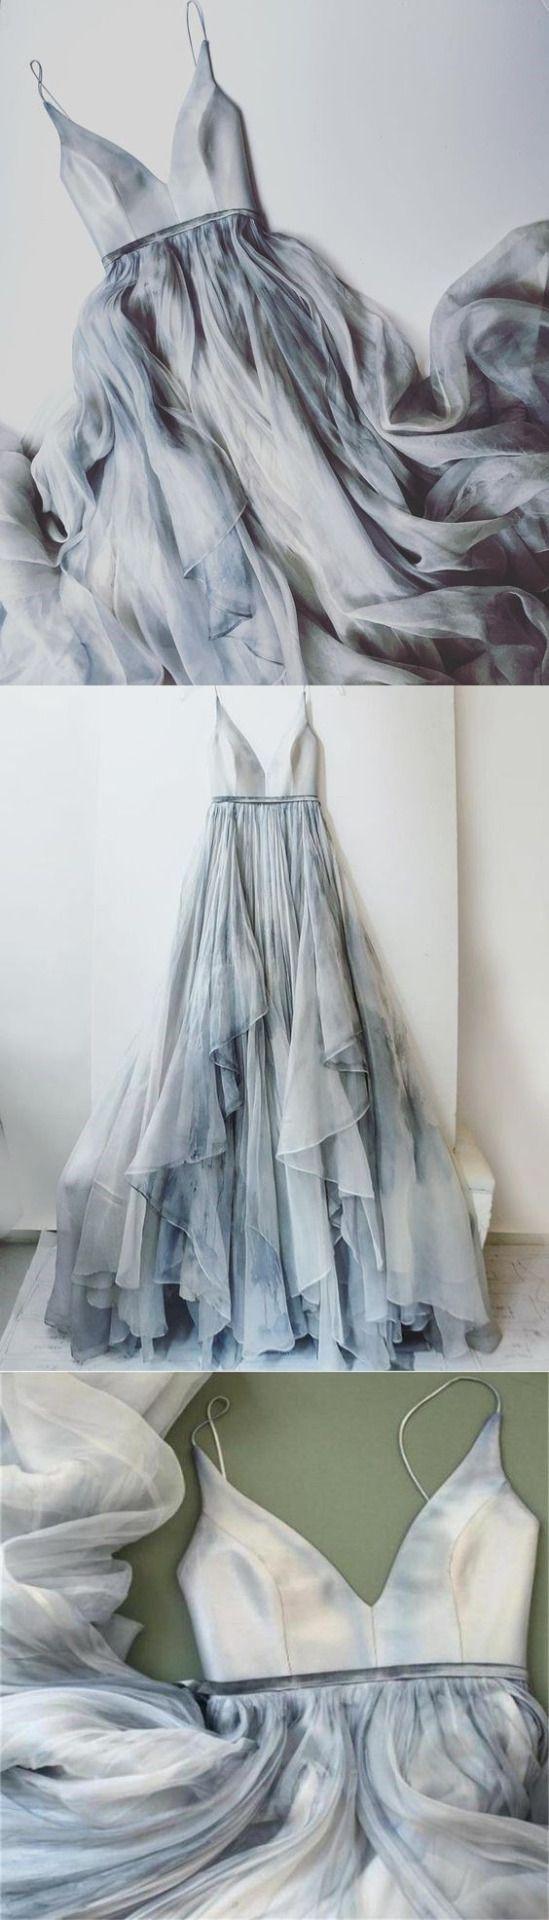 Elegant Prom Dress,Long Prom Dresses,Charming Prom Dresses,Evening Dress, Prom Gowns, Formal Women Dress,prom dress